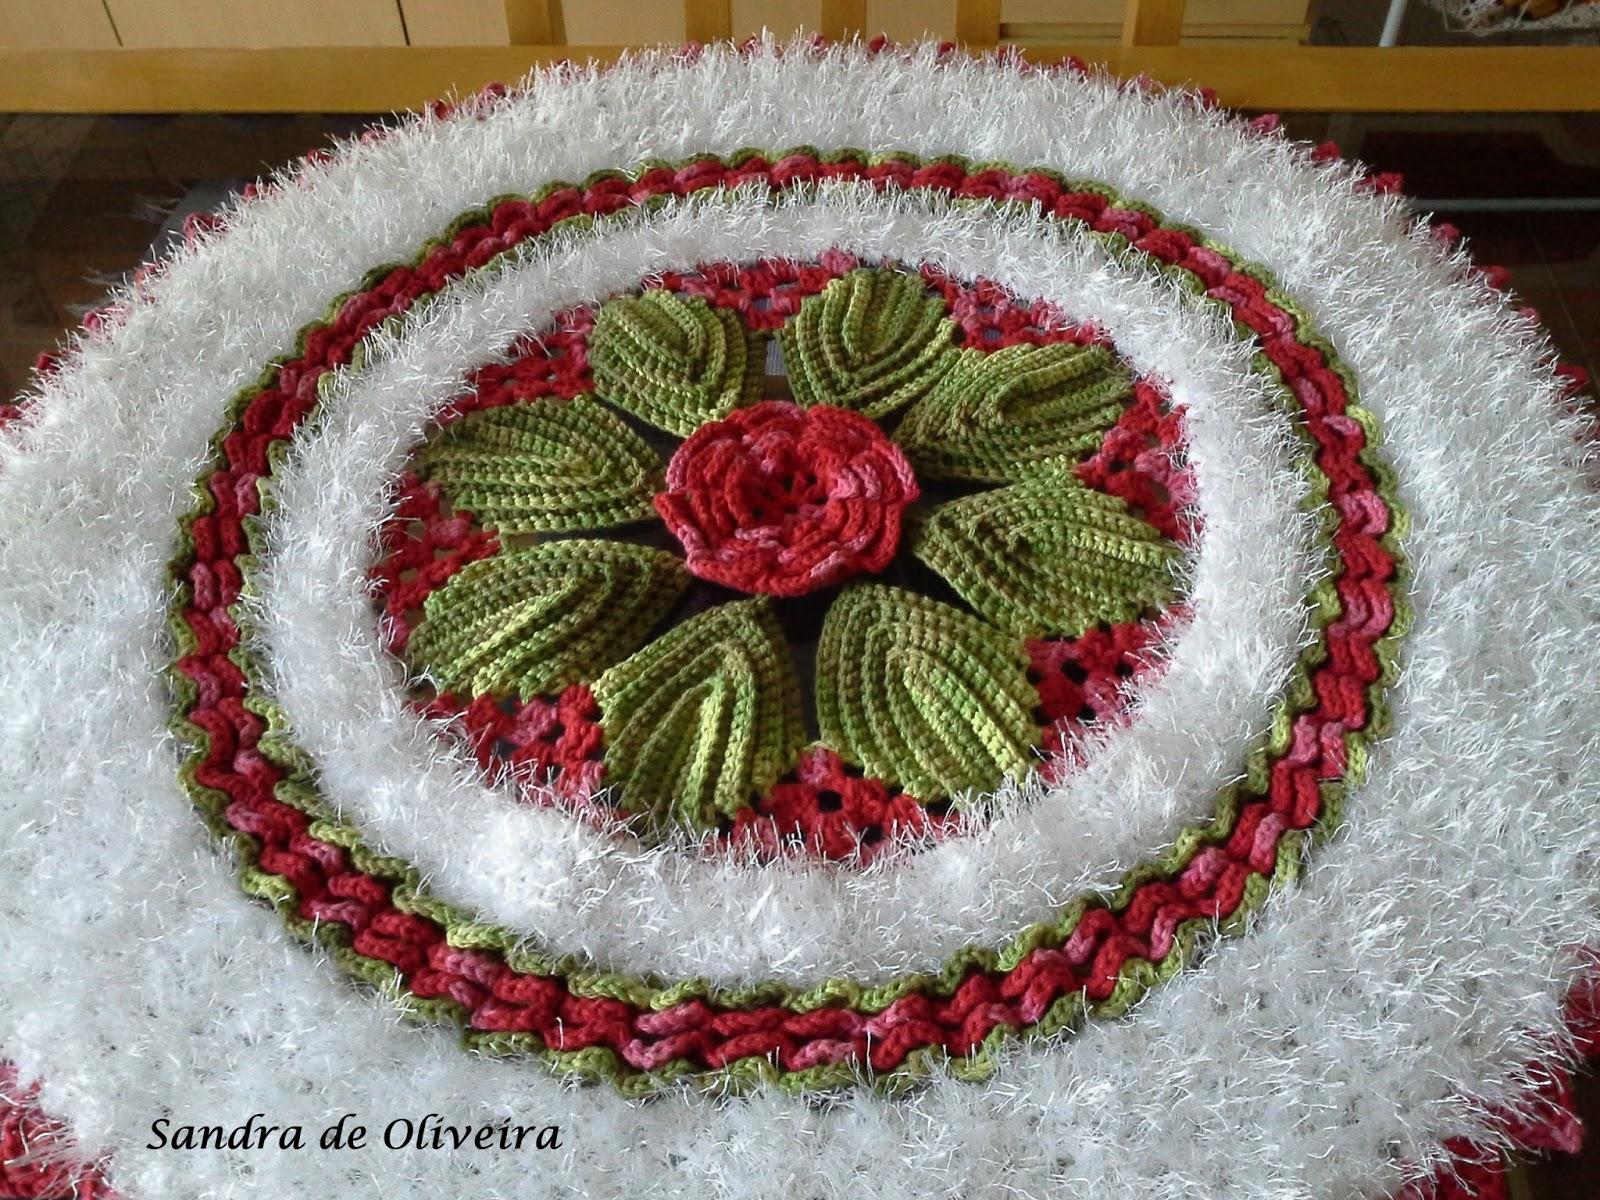 Pin crochet flores ninja saga news clases de tejidos a on for Clases de tapetes